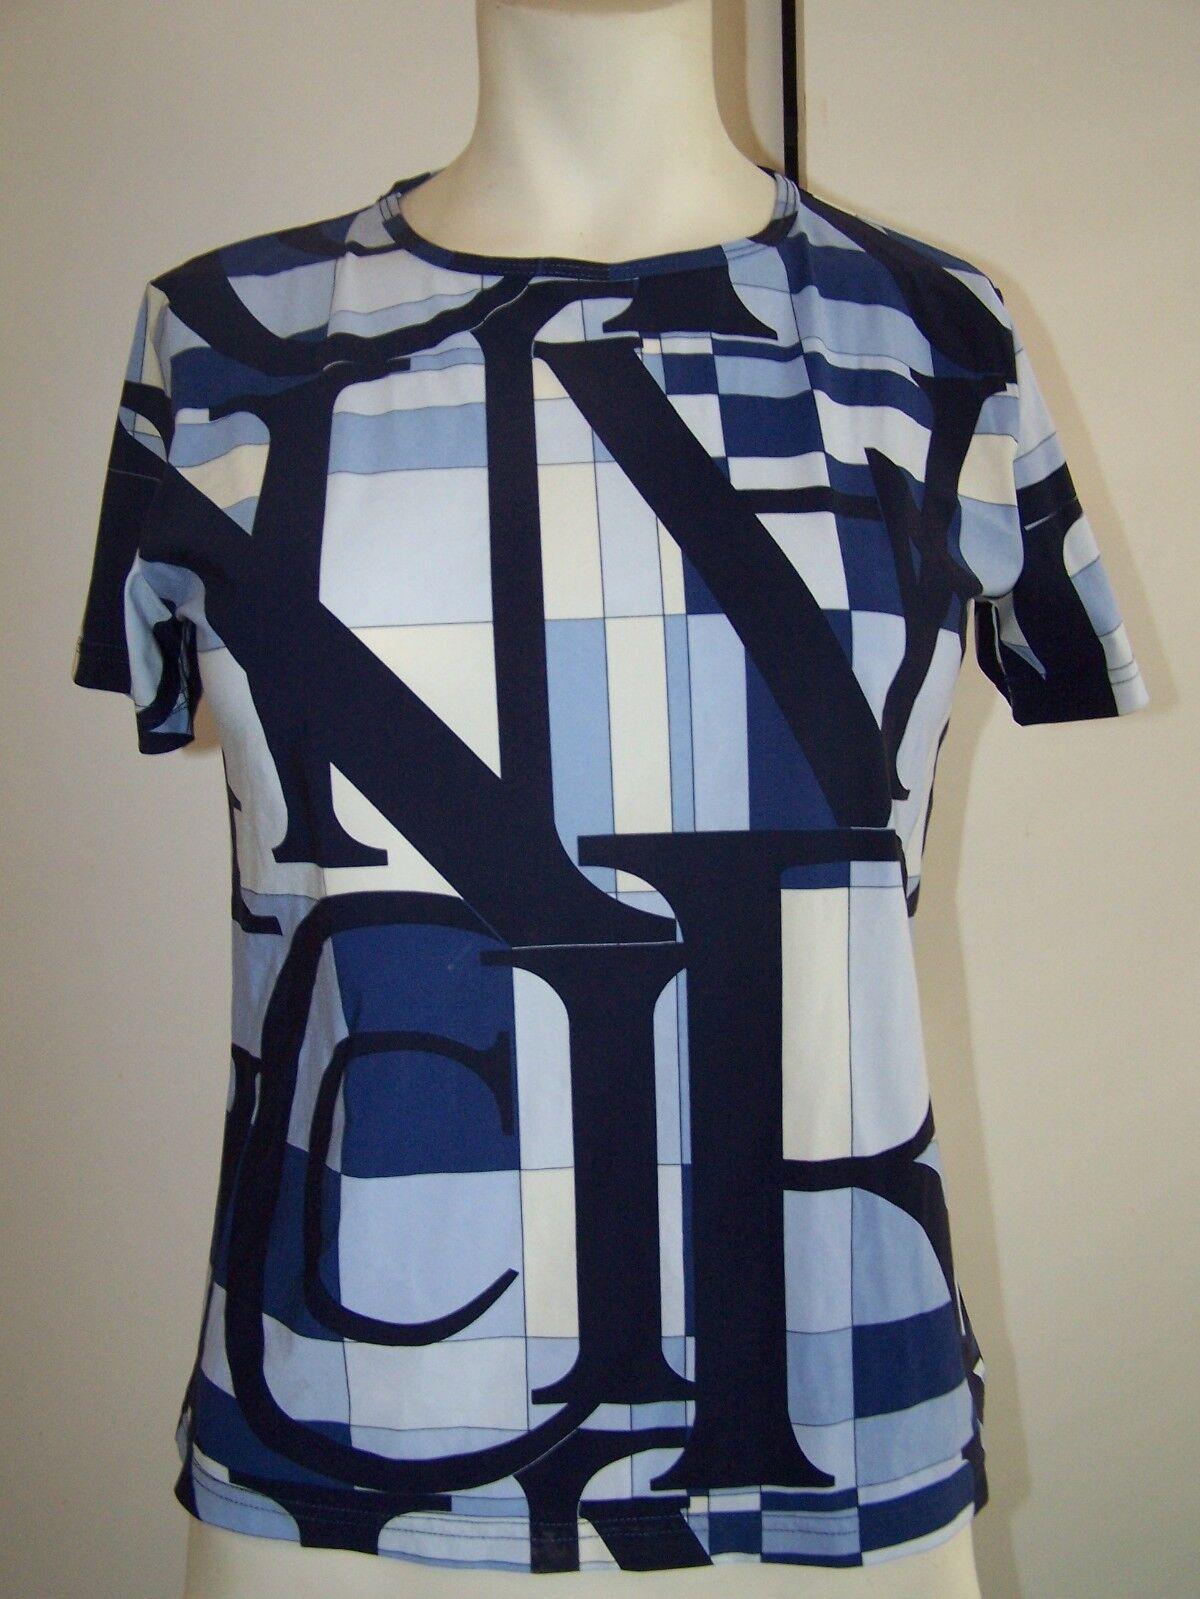 Nina Ricci Block Letters Blau Multi Hue Tee Shirt Top 46  US 8 10